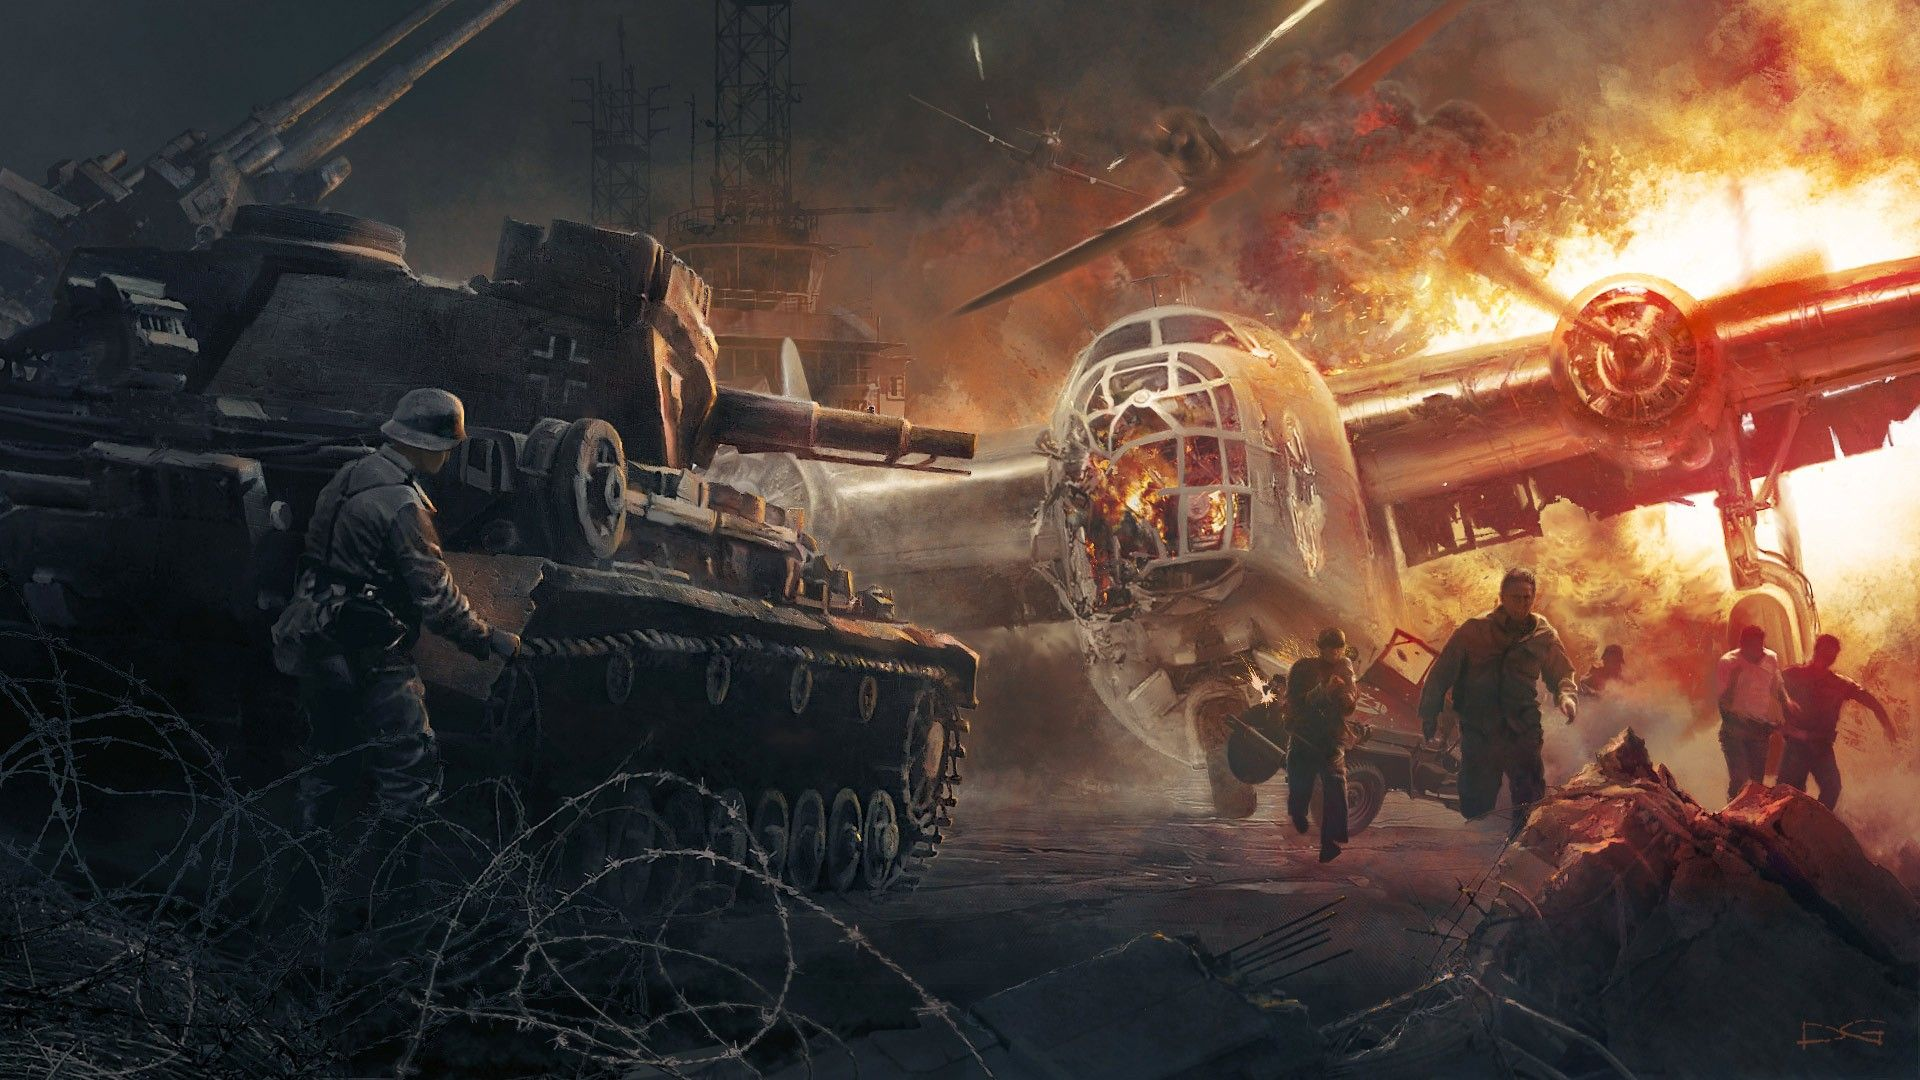 Full Military Battle Wallpapers Top Free Full Military Battle Backgrounds Wallpaperaccess